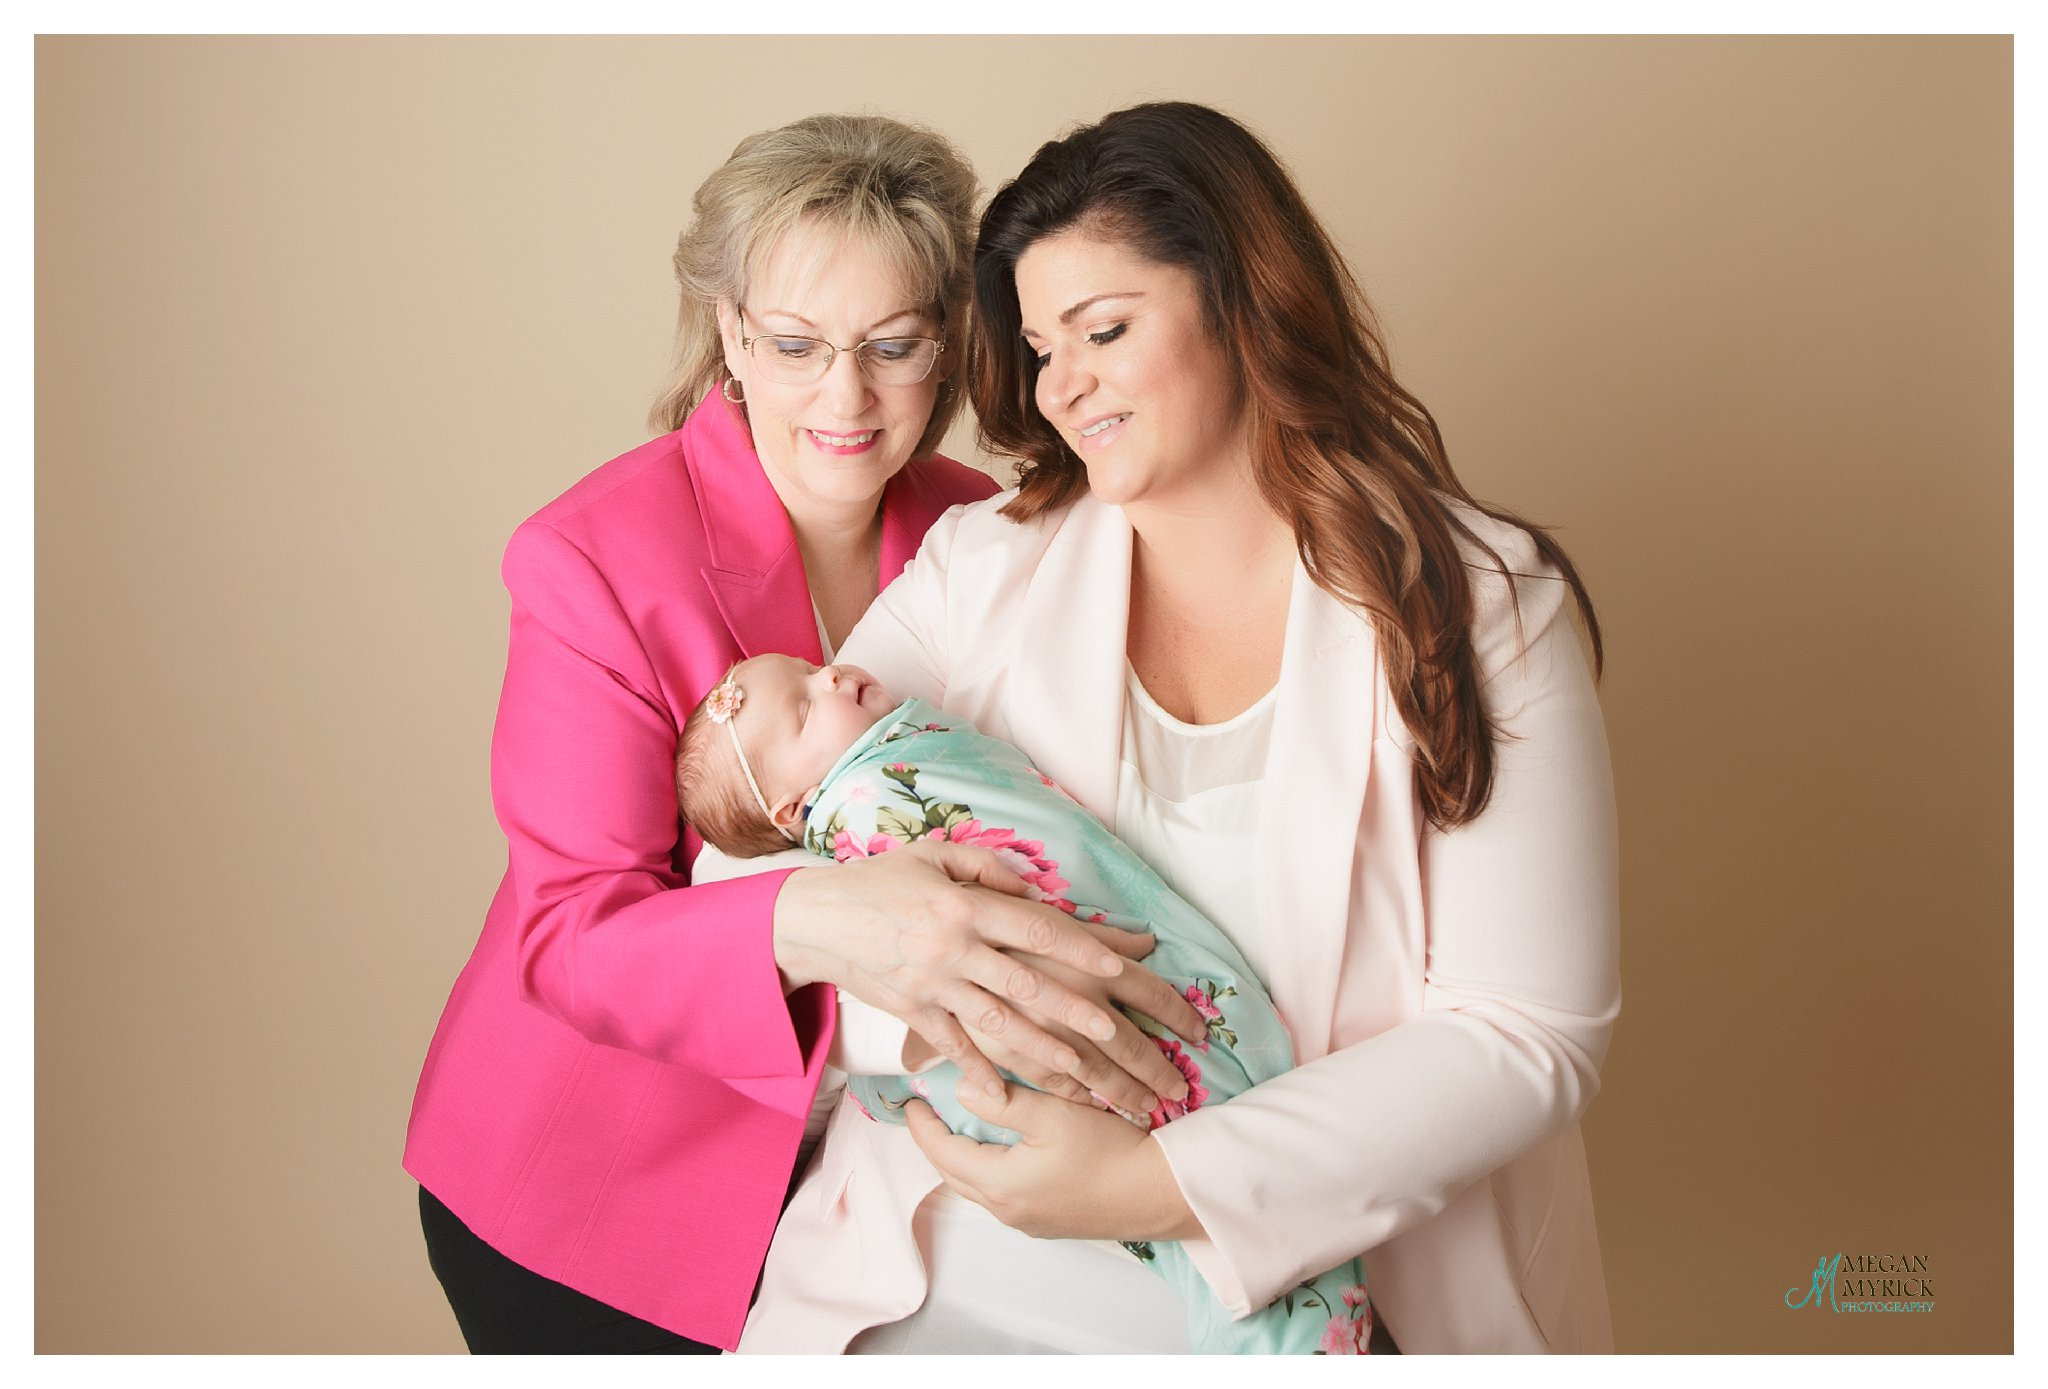 Hinesville Newborn Photographer | Megan Myrick Photography | www.meganmyrickphotography.com